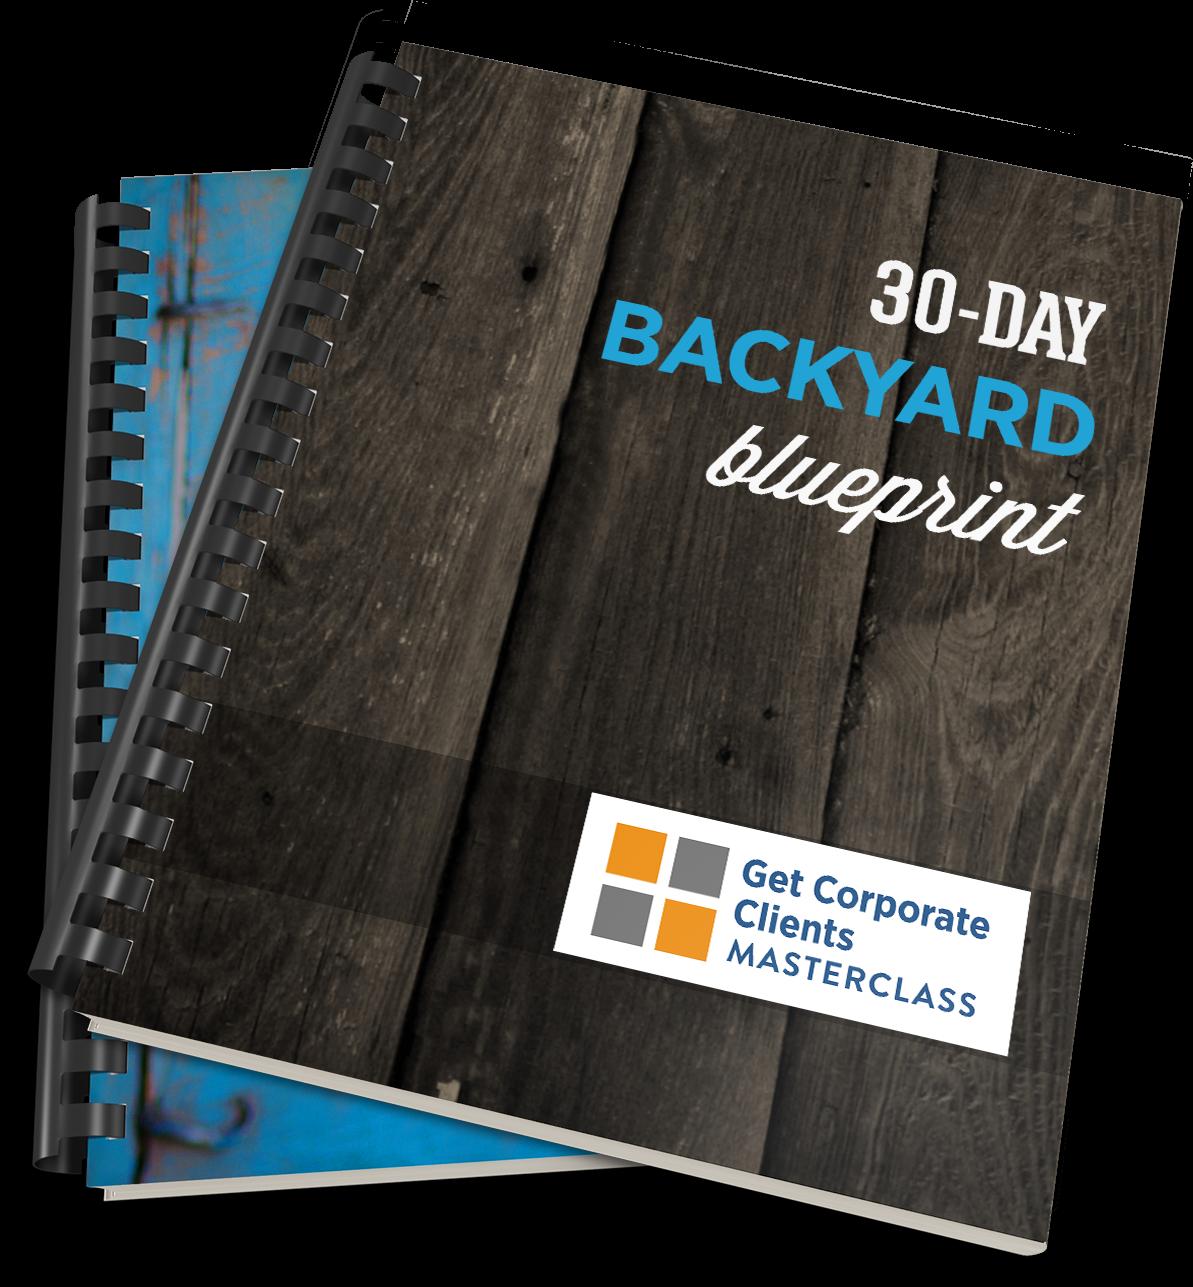 30-Day Backyard Blueprint